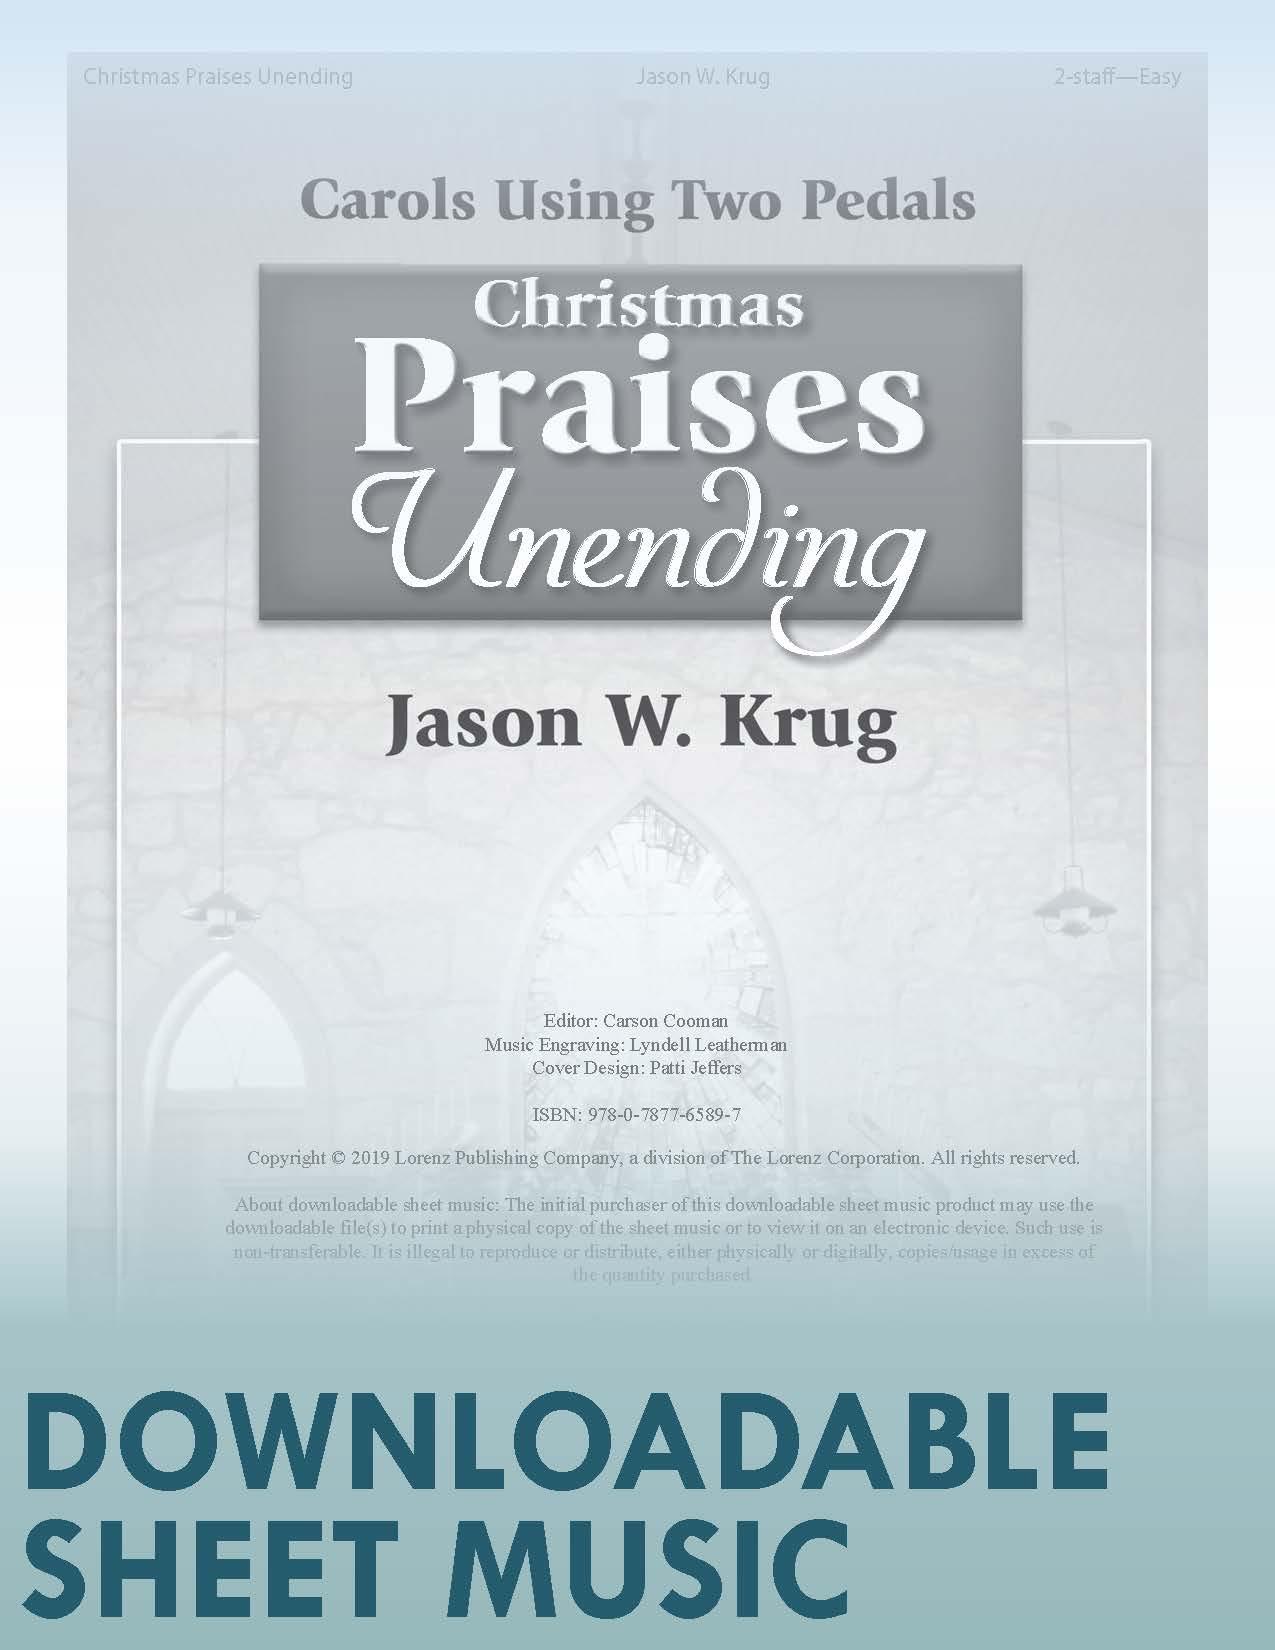 Christmas Music Downloadable.Christmas Praises Unending Digital Download